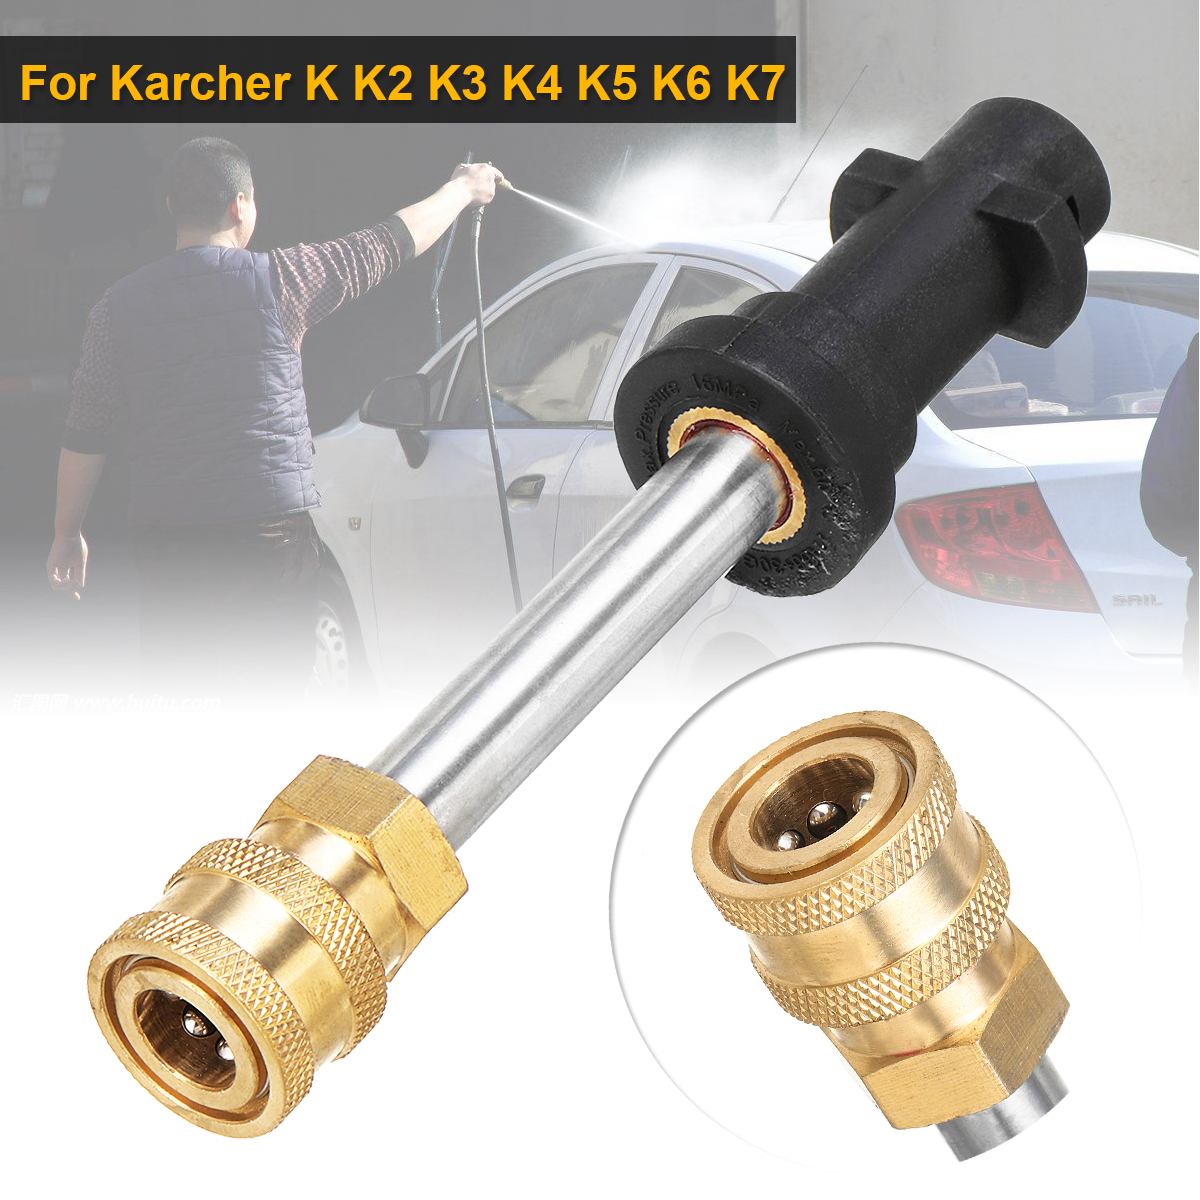 New  Female Conversion Fitting Pressure Washer Jet Wash Quick Release Car Washer Accessories for Karcher K K2 K3 K4 K5 K6 K7